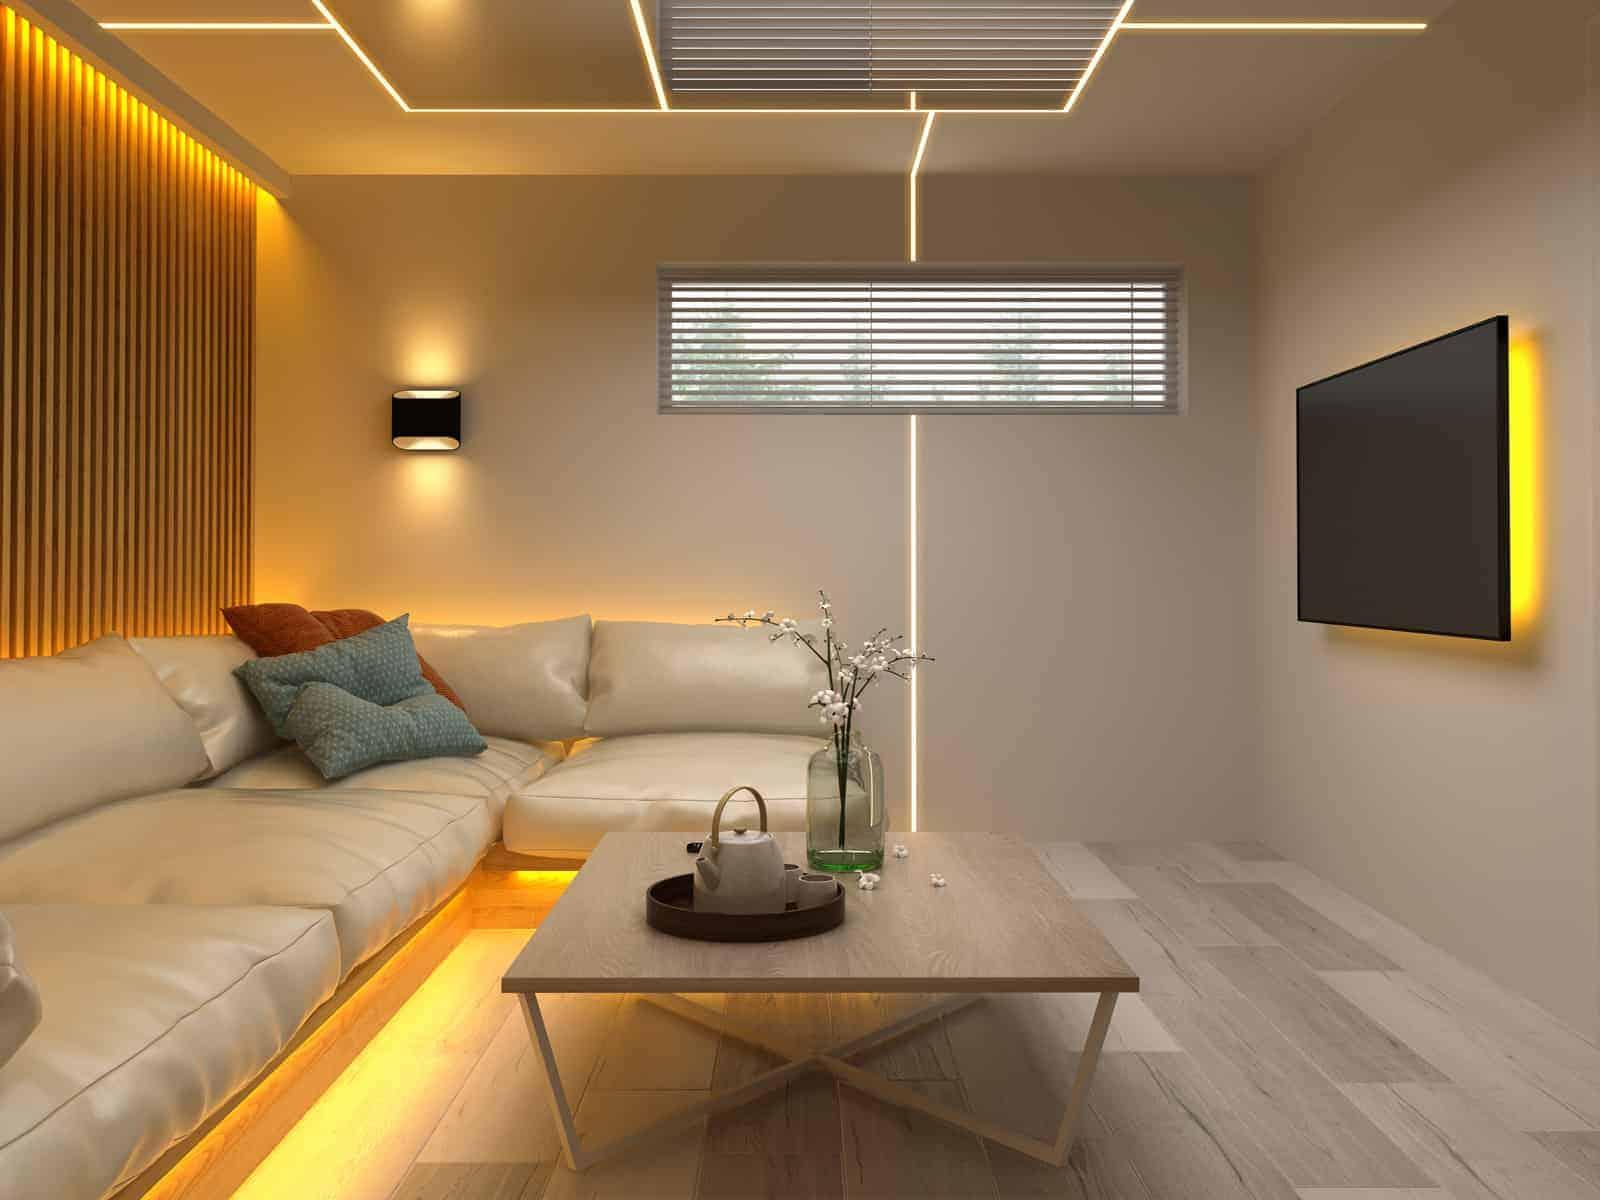 interior modern design room 3d illustration PL5TCZA 1 The Plus Addons for Elementor